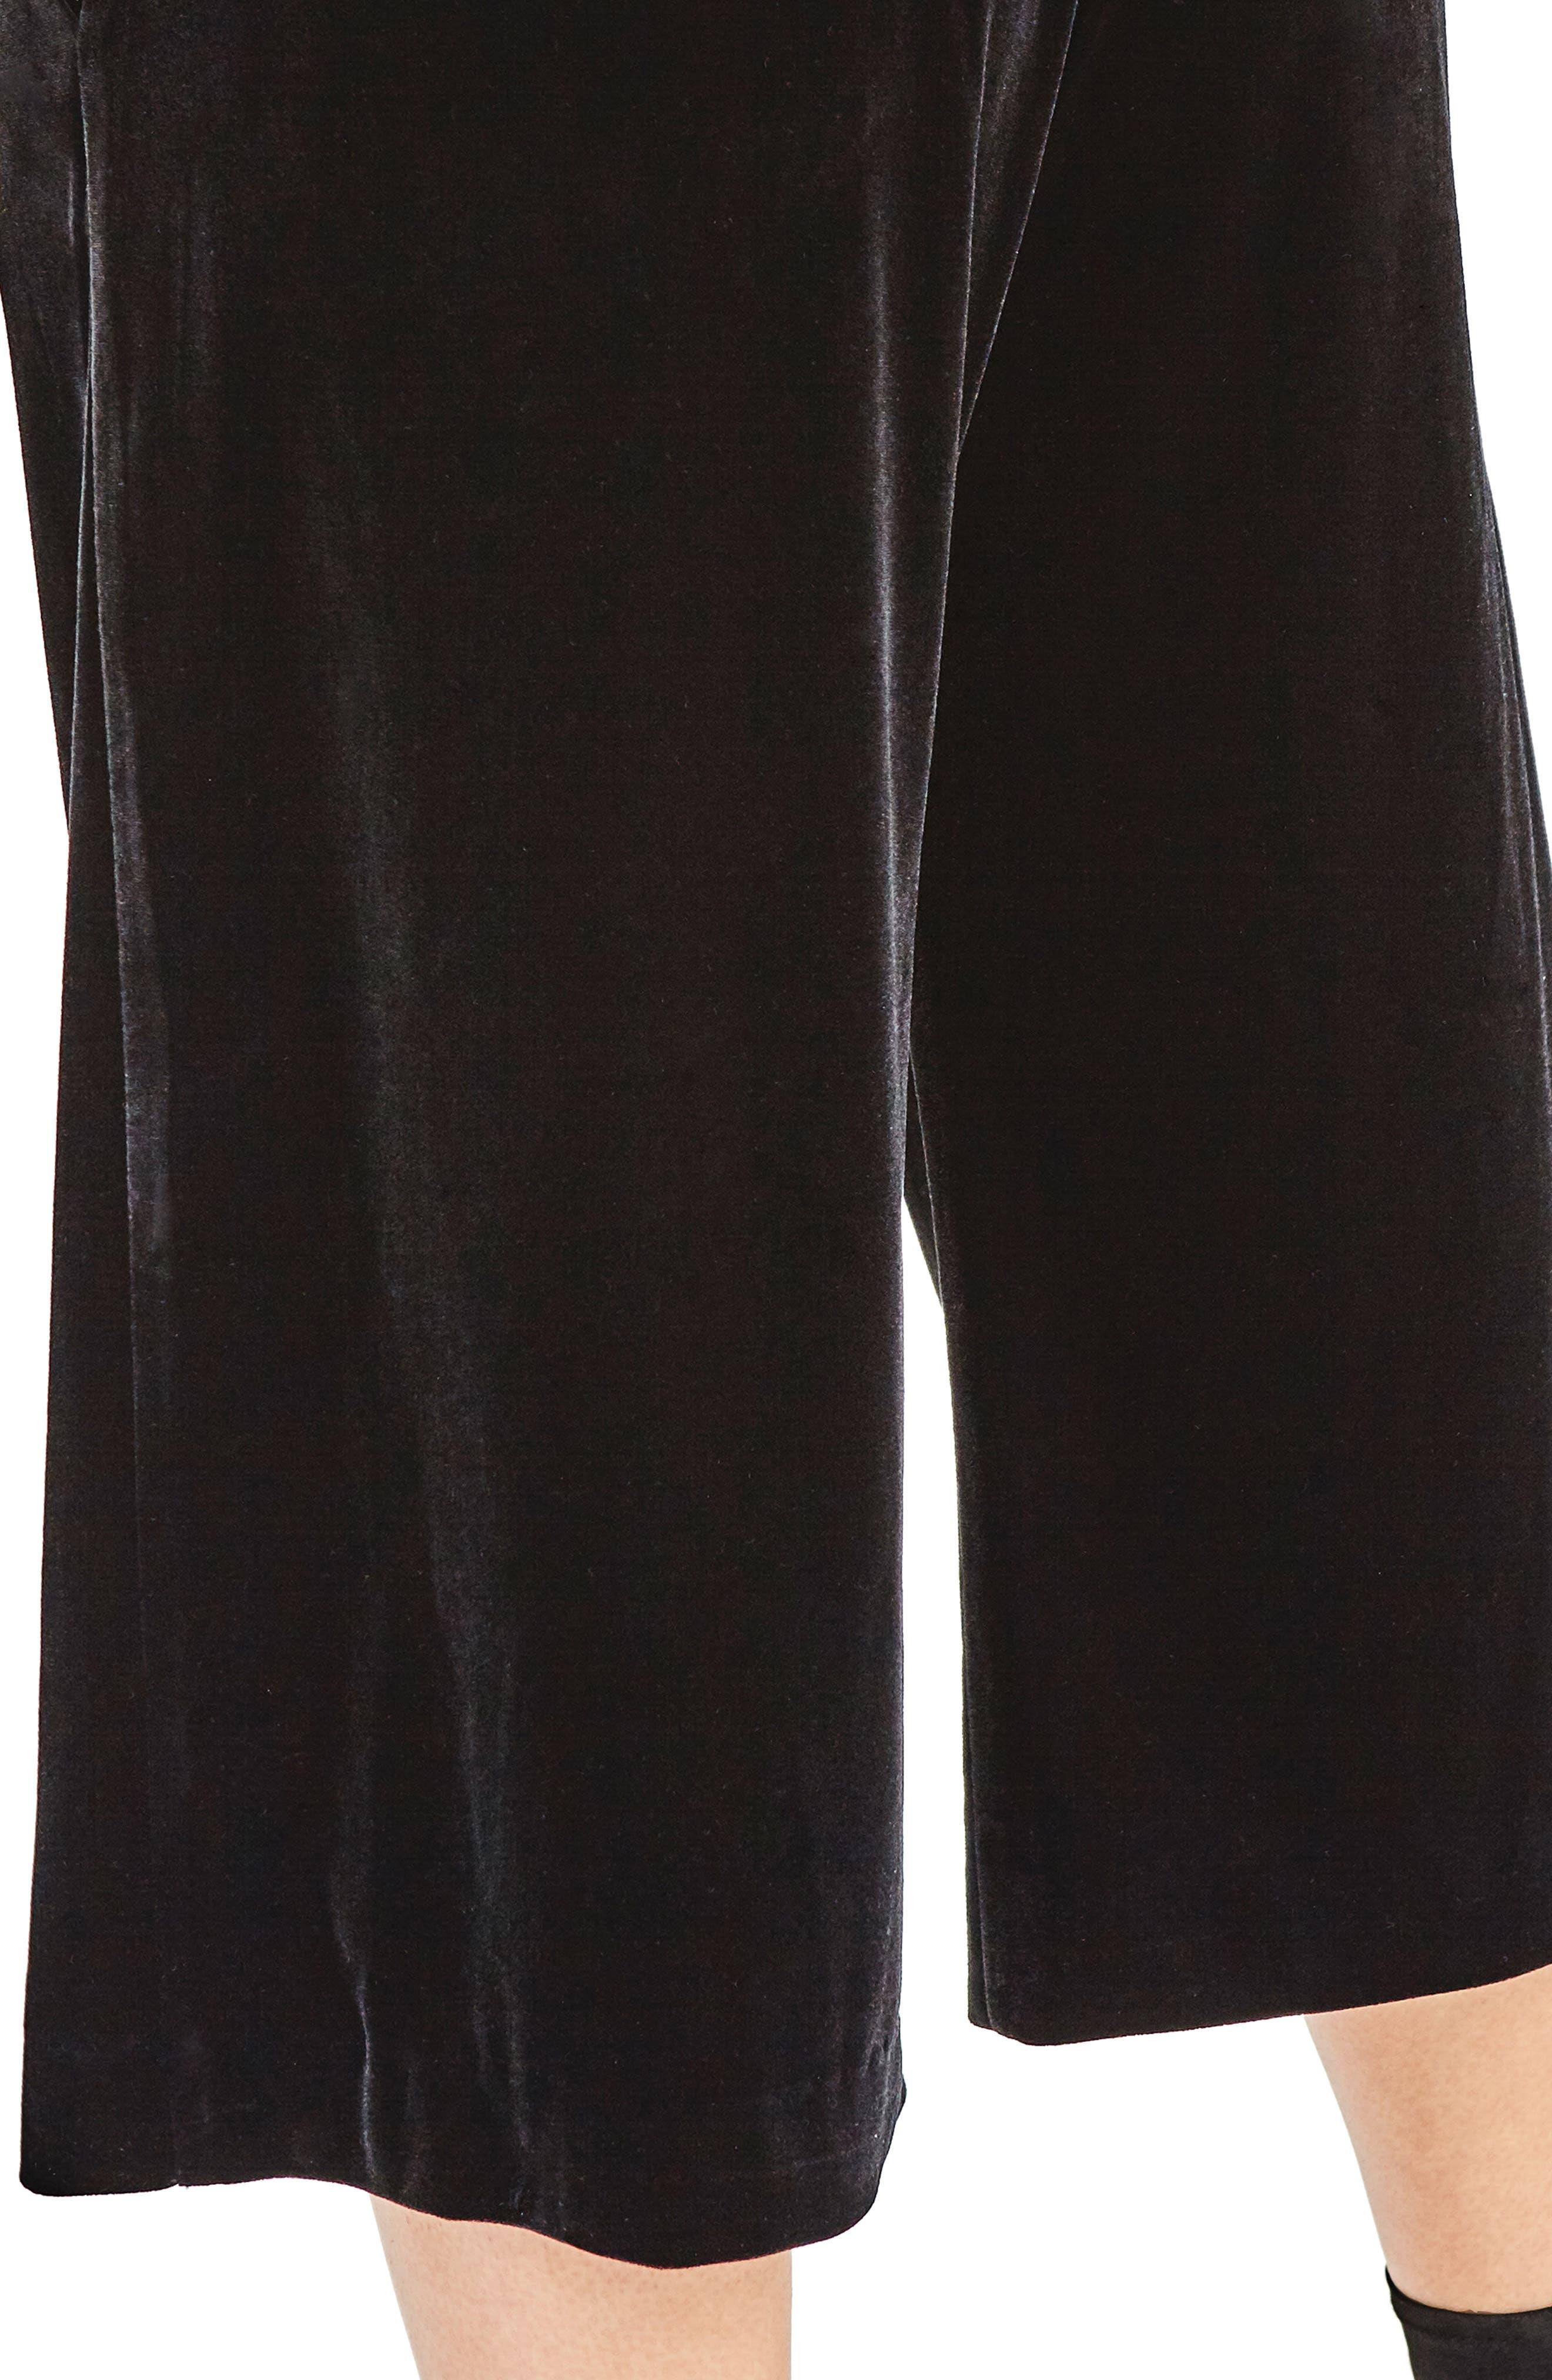 Black Velvet Culottes,                             Alternate thumbnail 4, color,